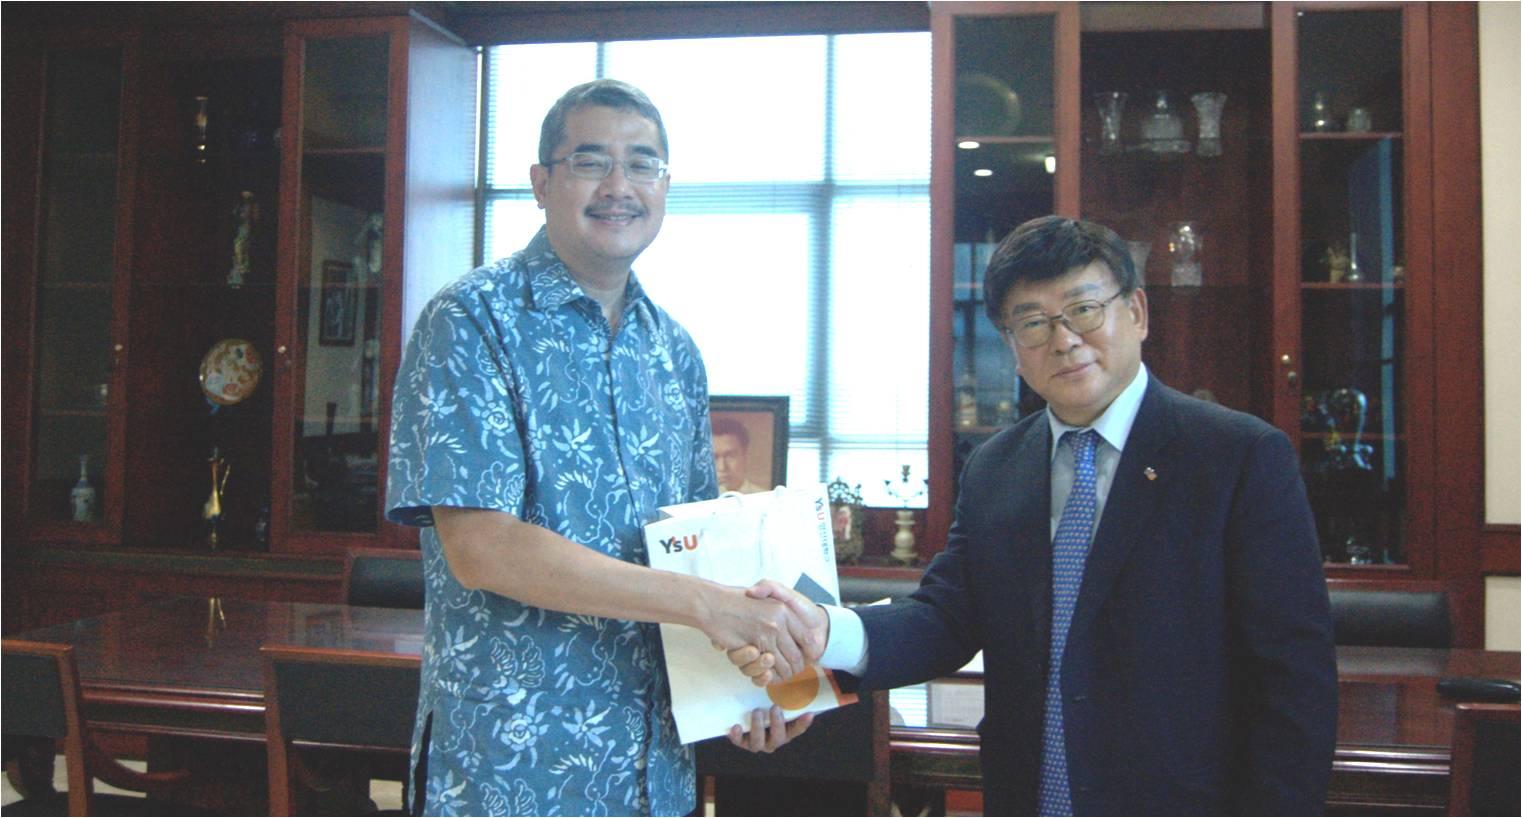 Penjajakan Kerjasama Youngsan University Korea dengan Universitas Esa Unggul